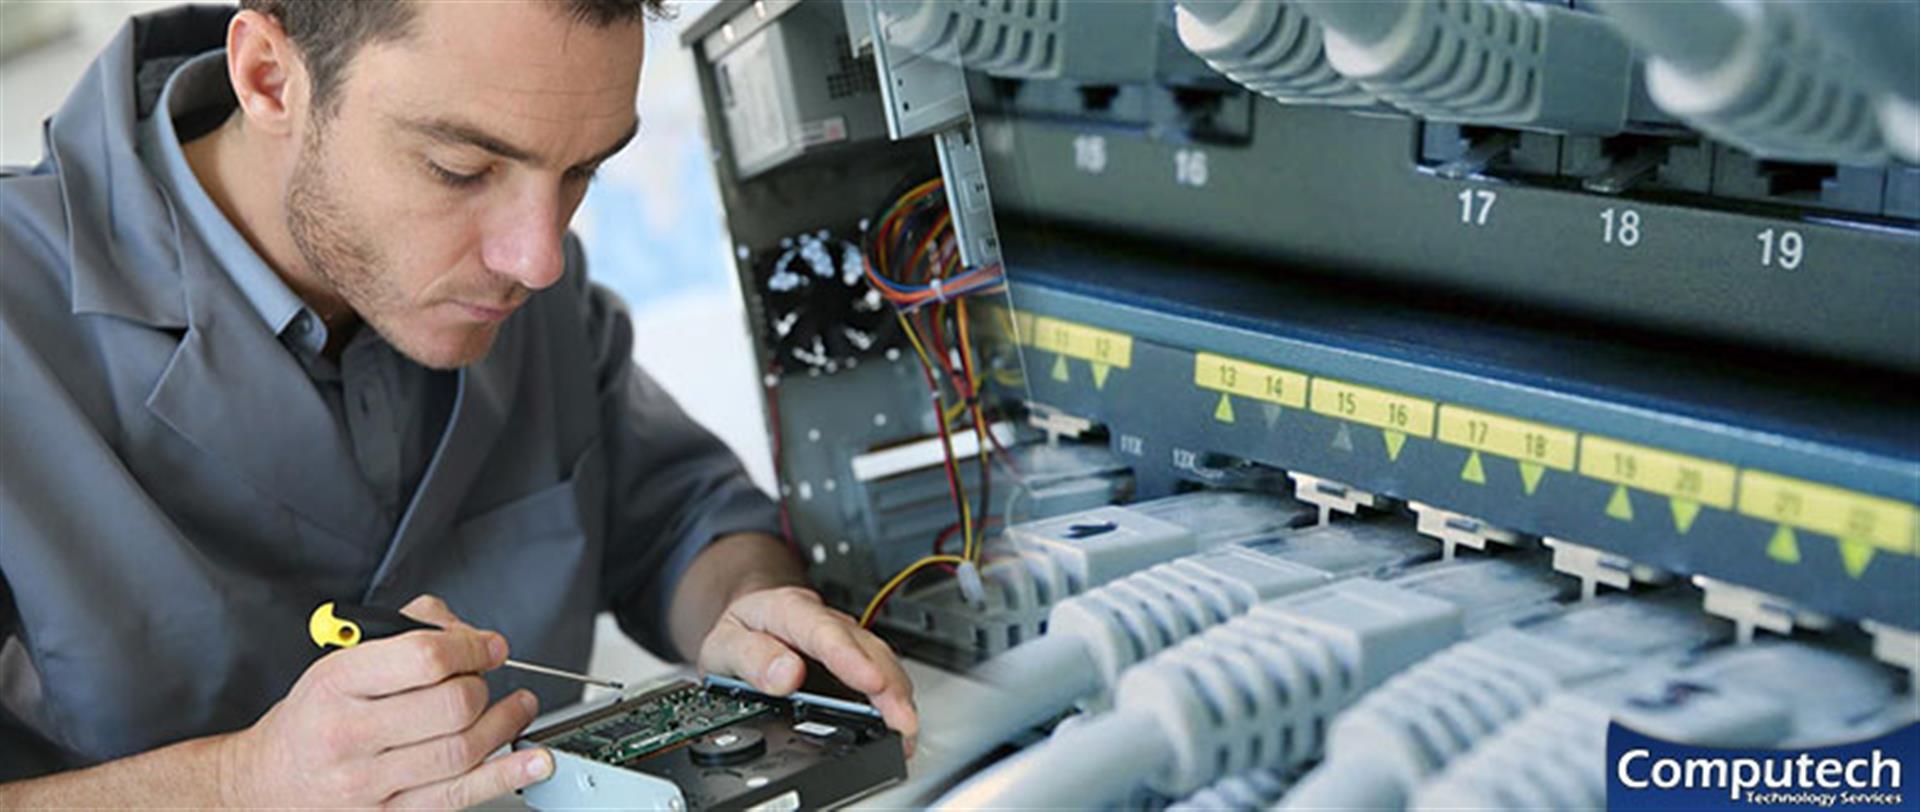 Blacksburg Virginia On Site Computer & Printer Repair, Networking, Voice & Data Cabling Solutions